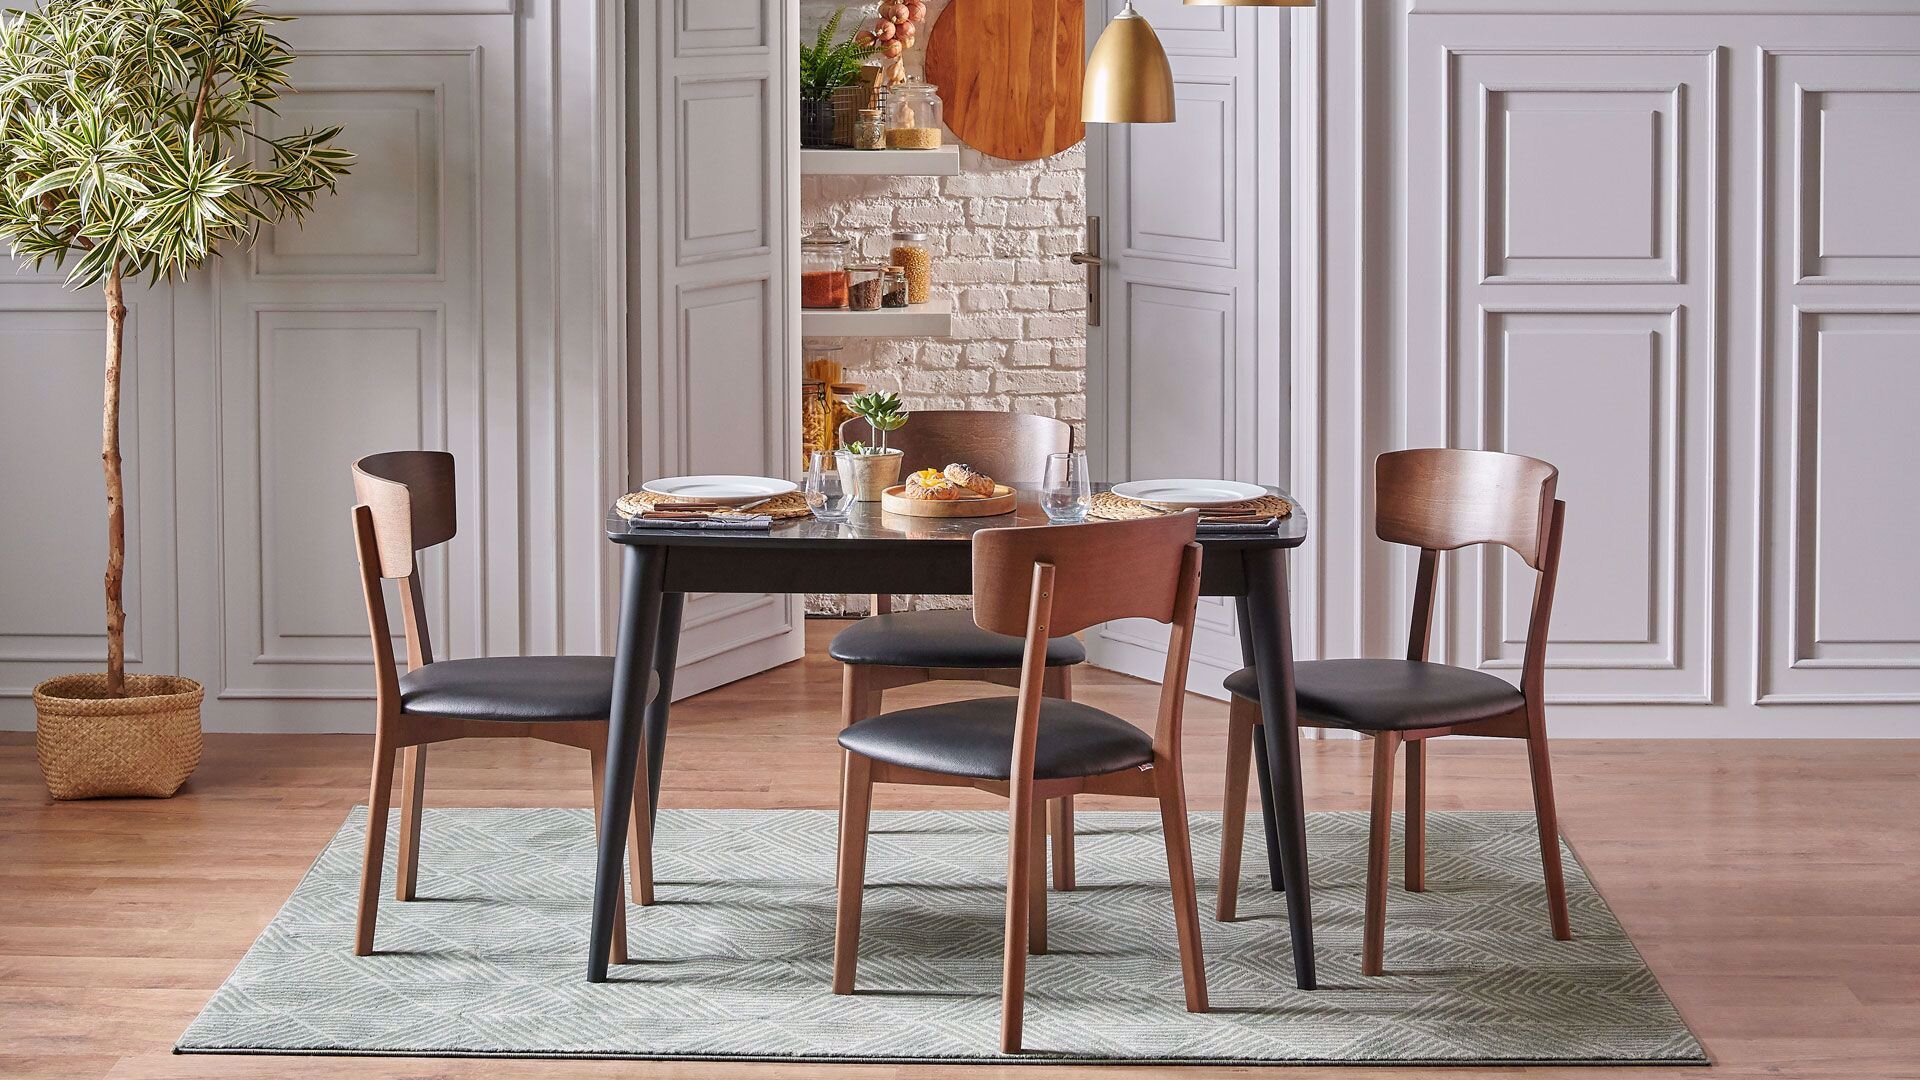 Pedra Mutfak Masa Ve Sandalyeleri